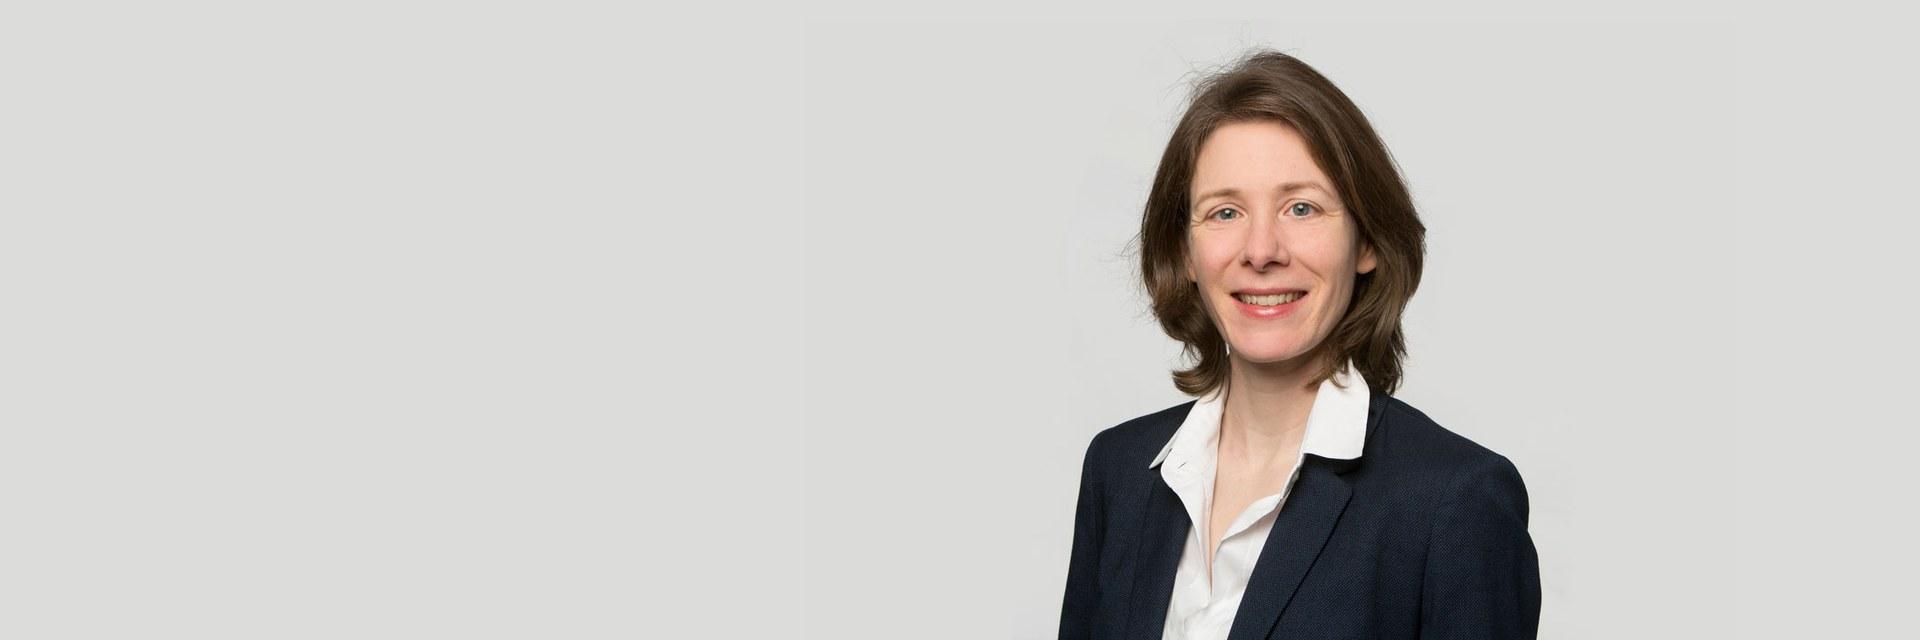 Dr. Corinne Mühlebach